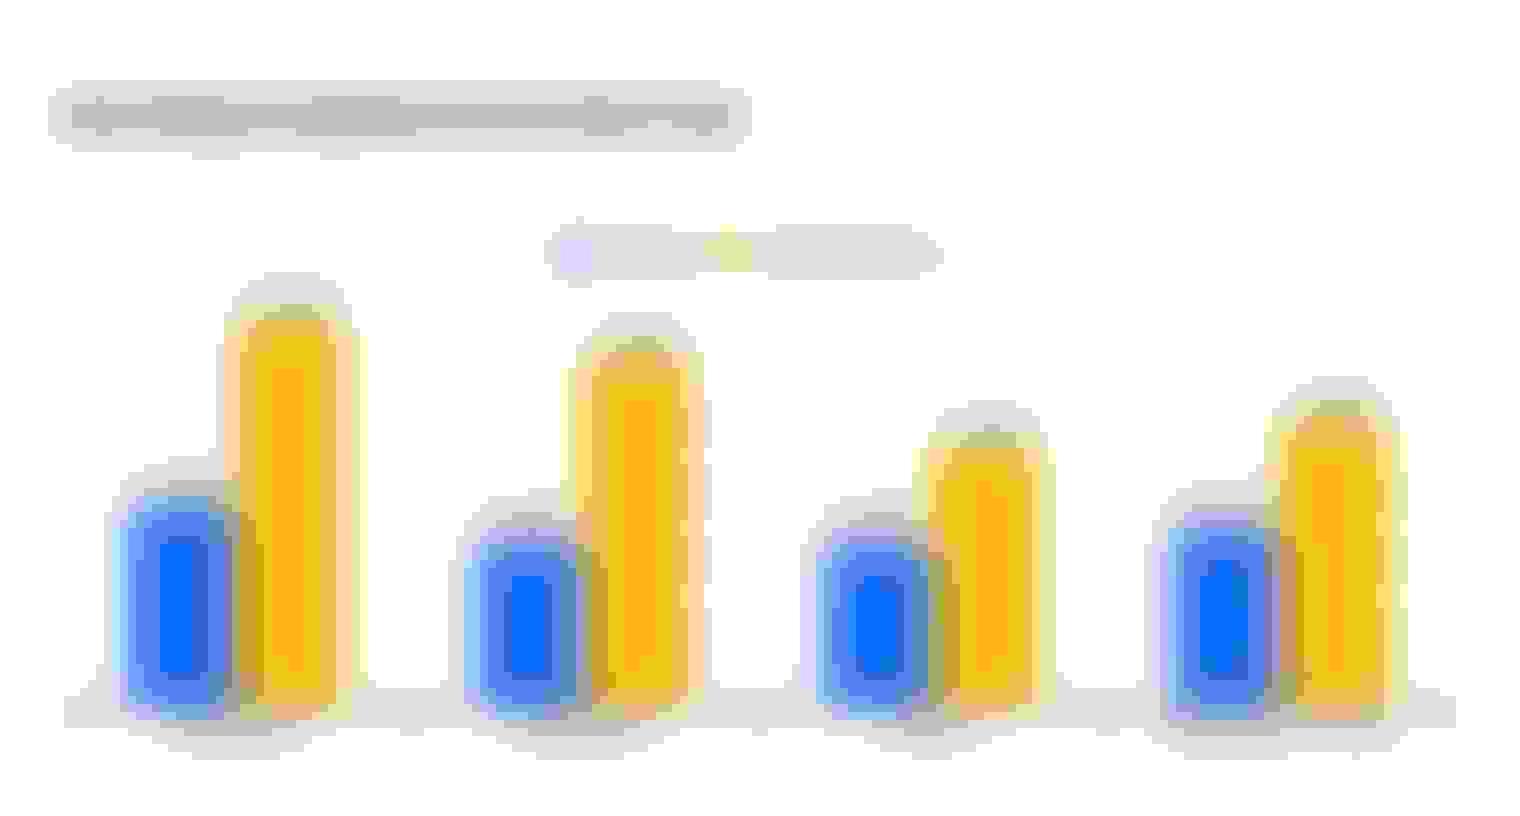 Interchange Comparison by Purchase Type